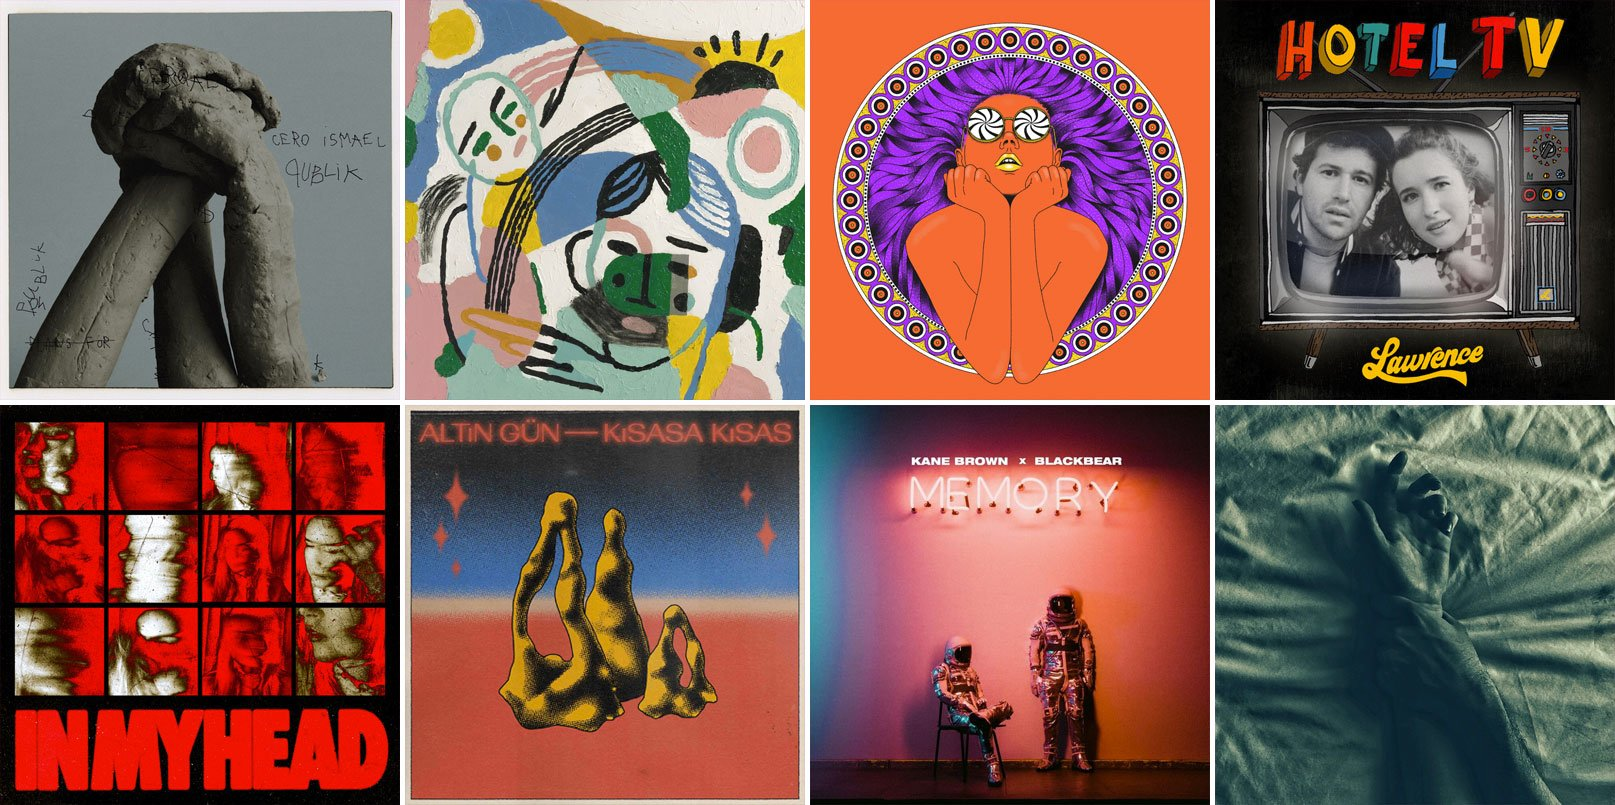 IQ August New Music playlist